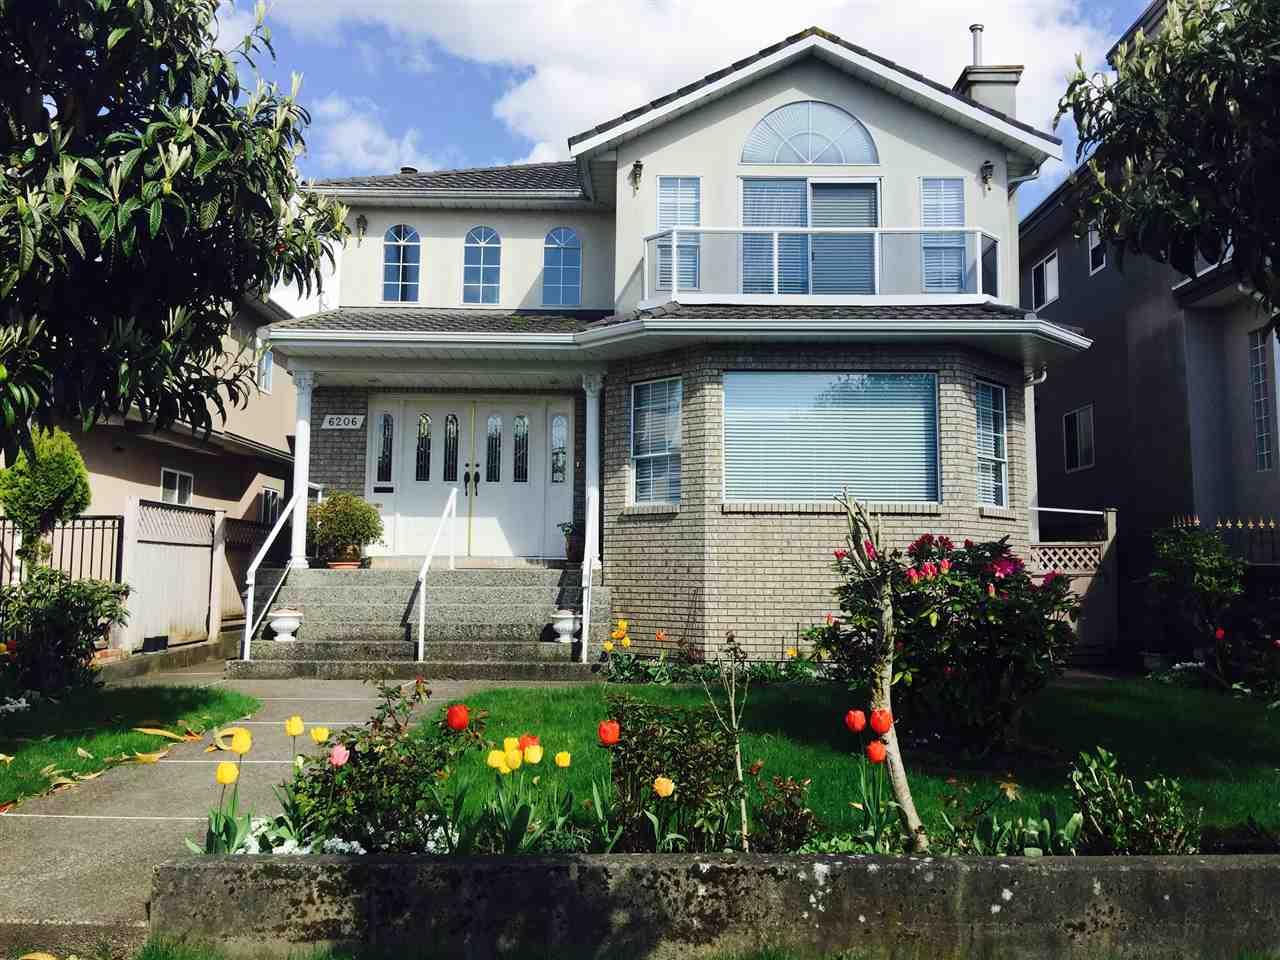 6206 DOMAN STREET, Vancouver, BC V5S 3G6